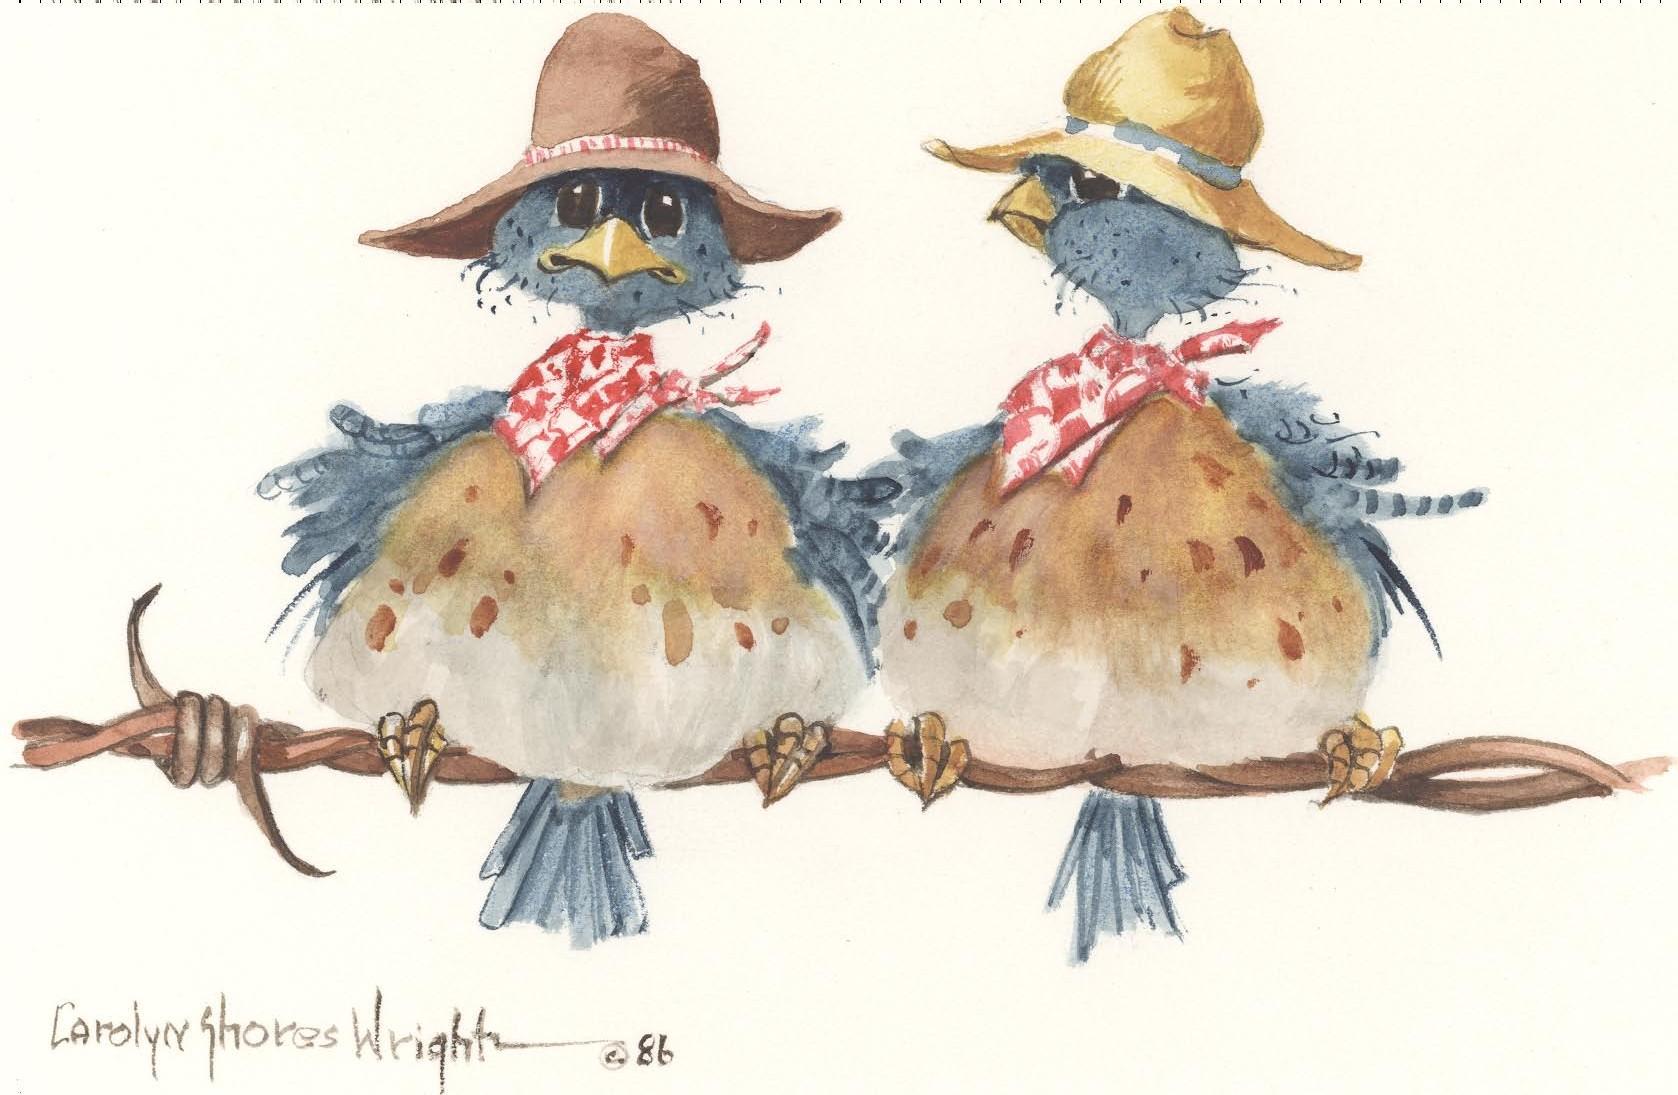 Carolyn Shores Wright Clipart.